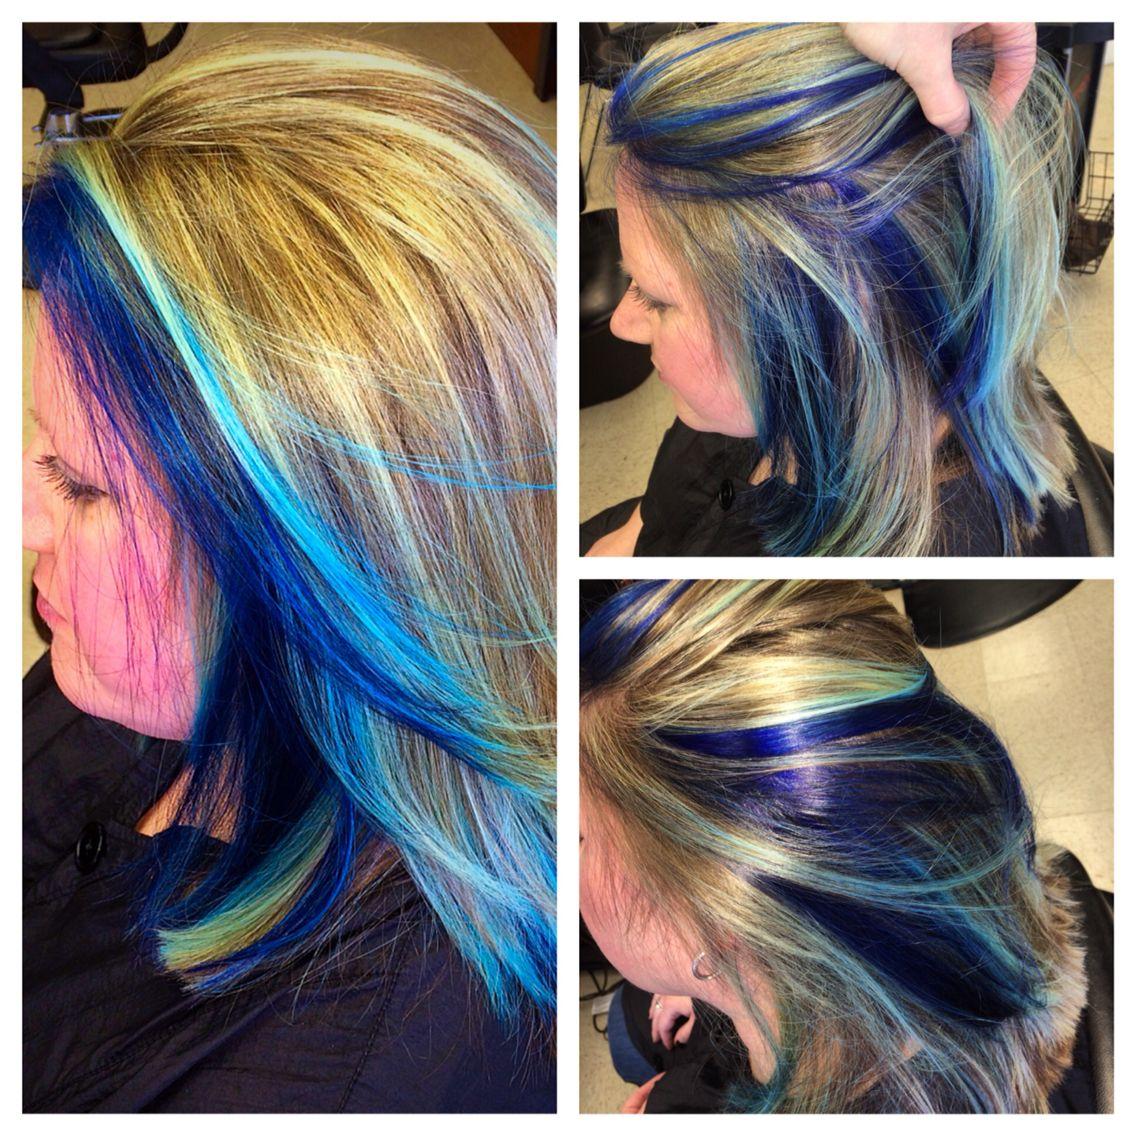 Blue Peekaboo Highlights Blue Peekaboo Highlights Peekaboo Hair Peekaboo Highlights